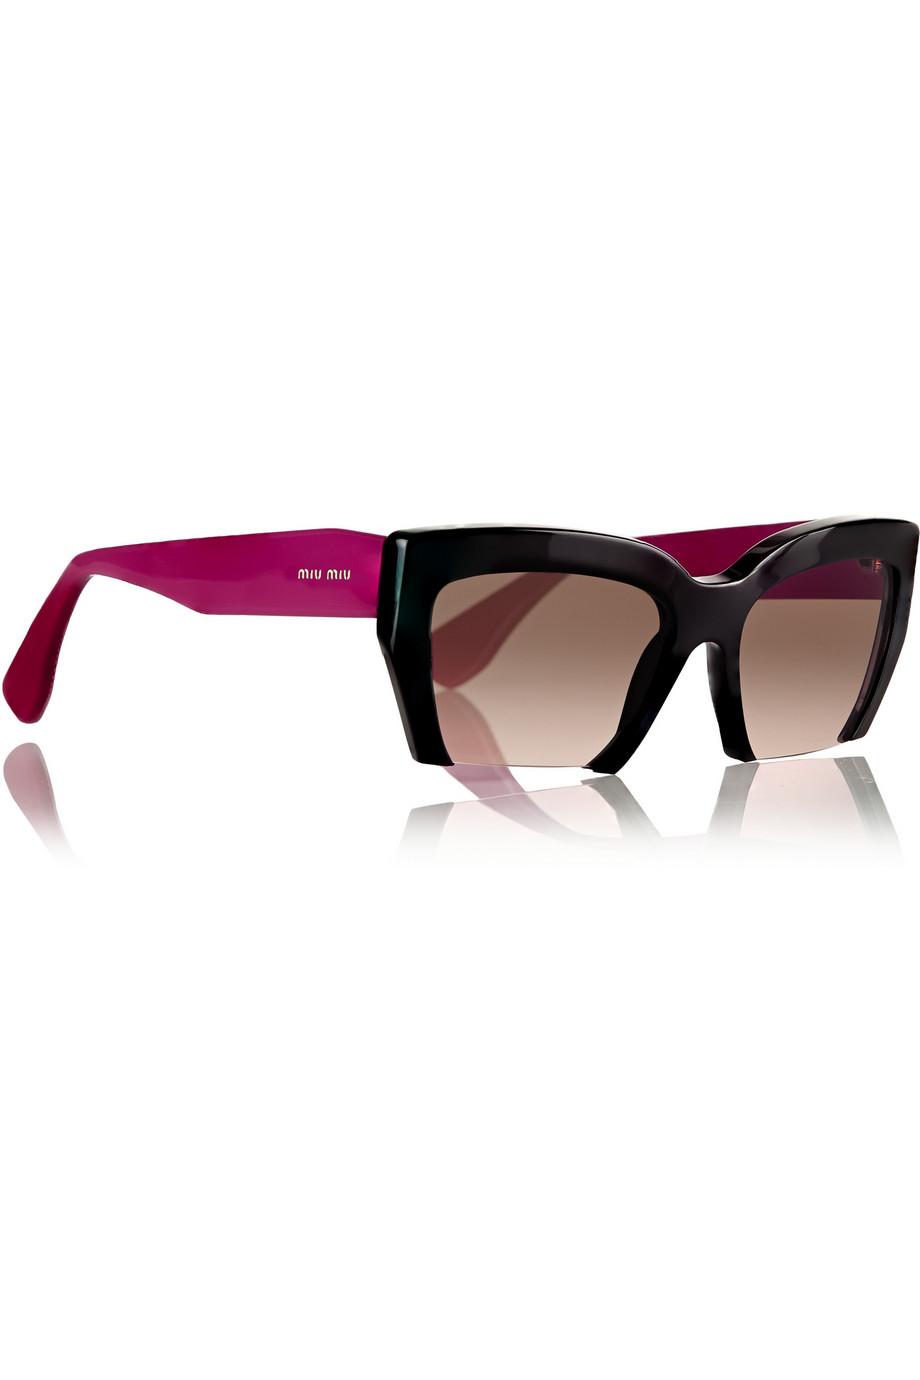 bdc8cf4bf3 Miu Miu Two-Tone Cat Eye Acetate Sunglasses in Purple - Lyst